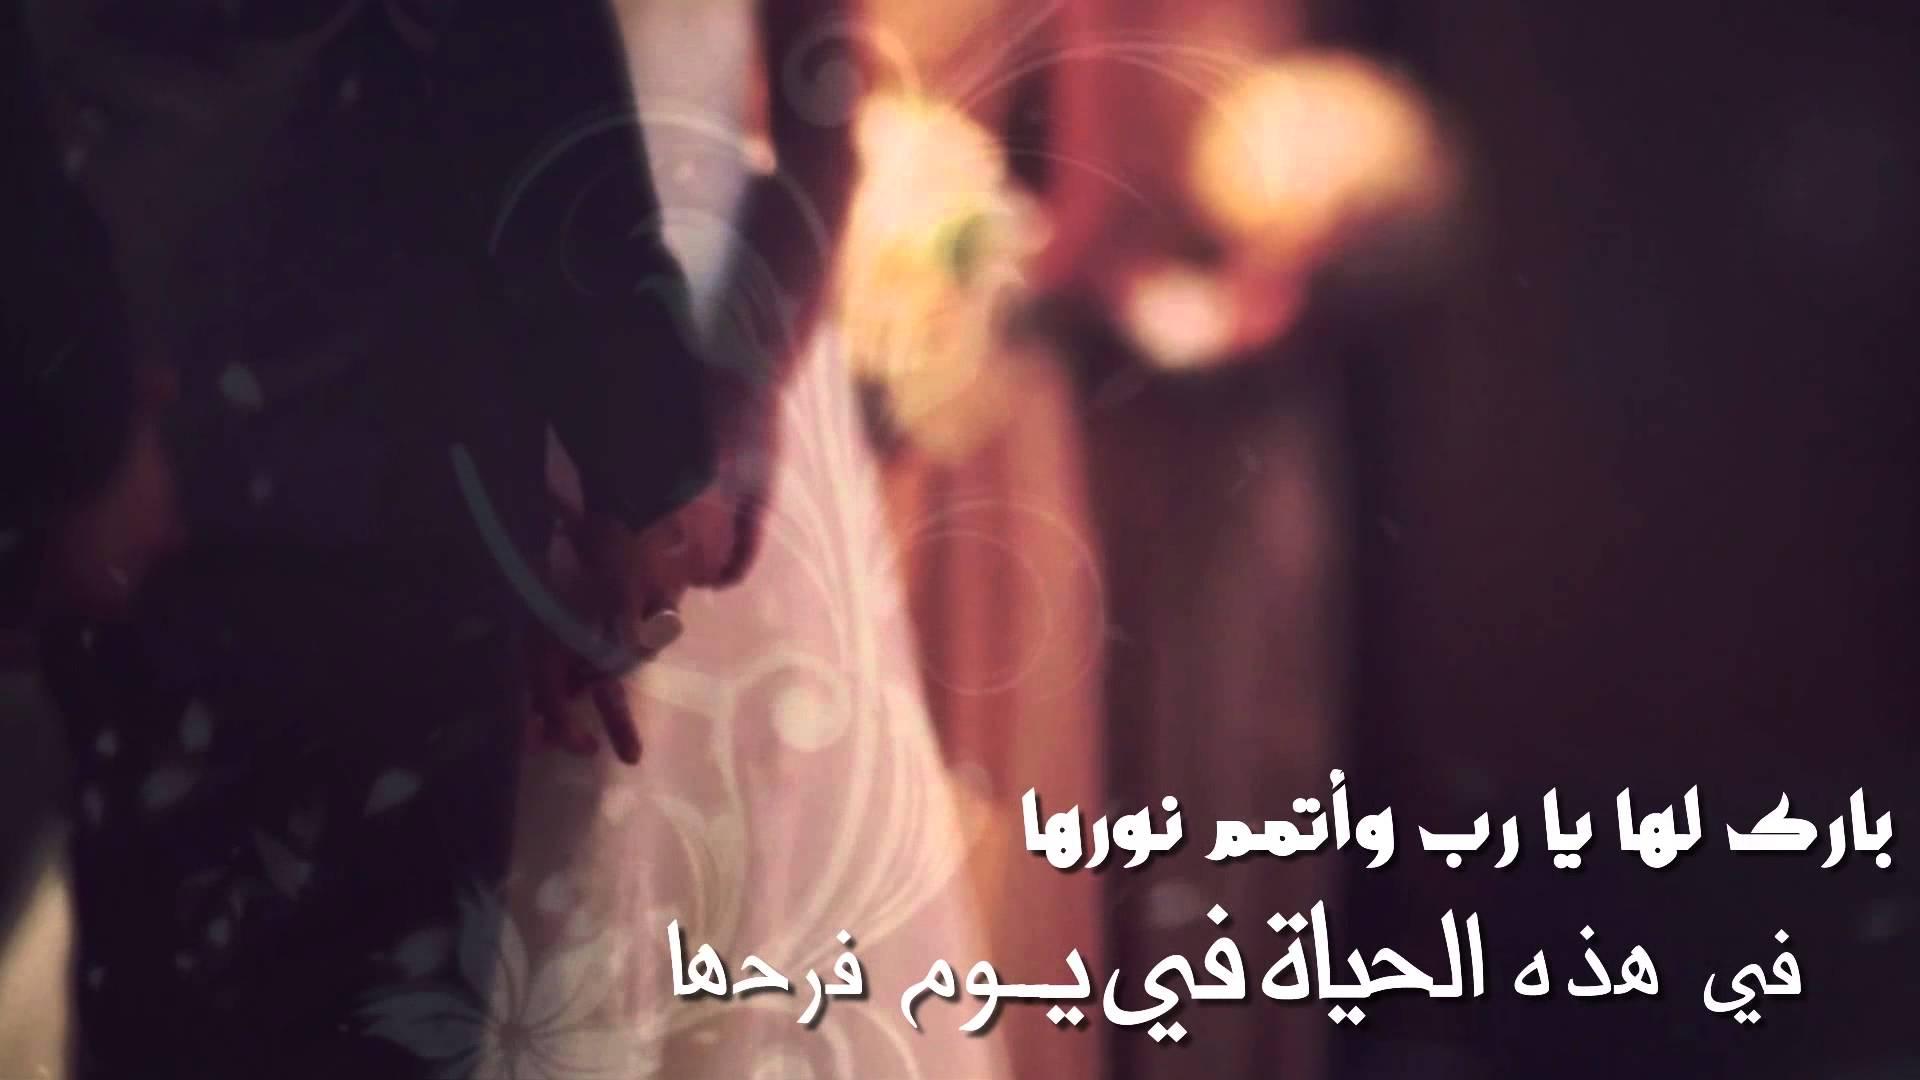 بالصور عبارات للعروس , اجمل عبارات التهنئه للعروسين 5842 8